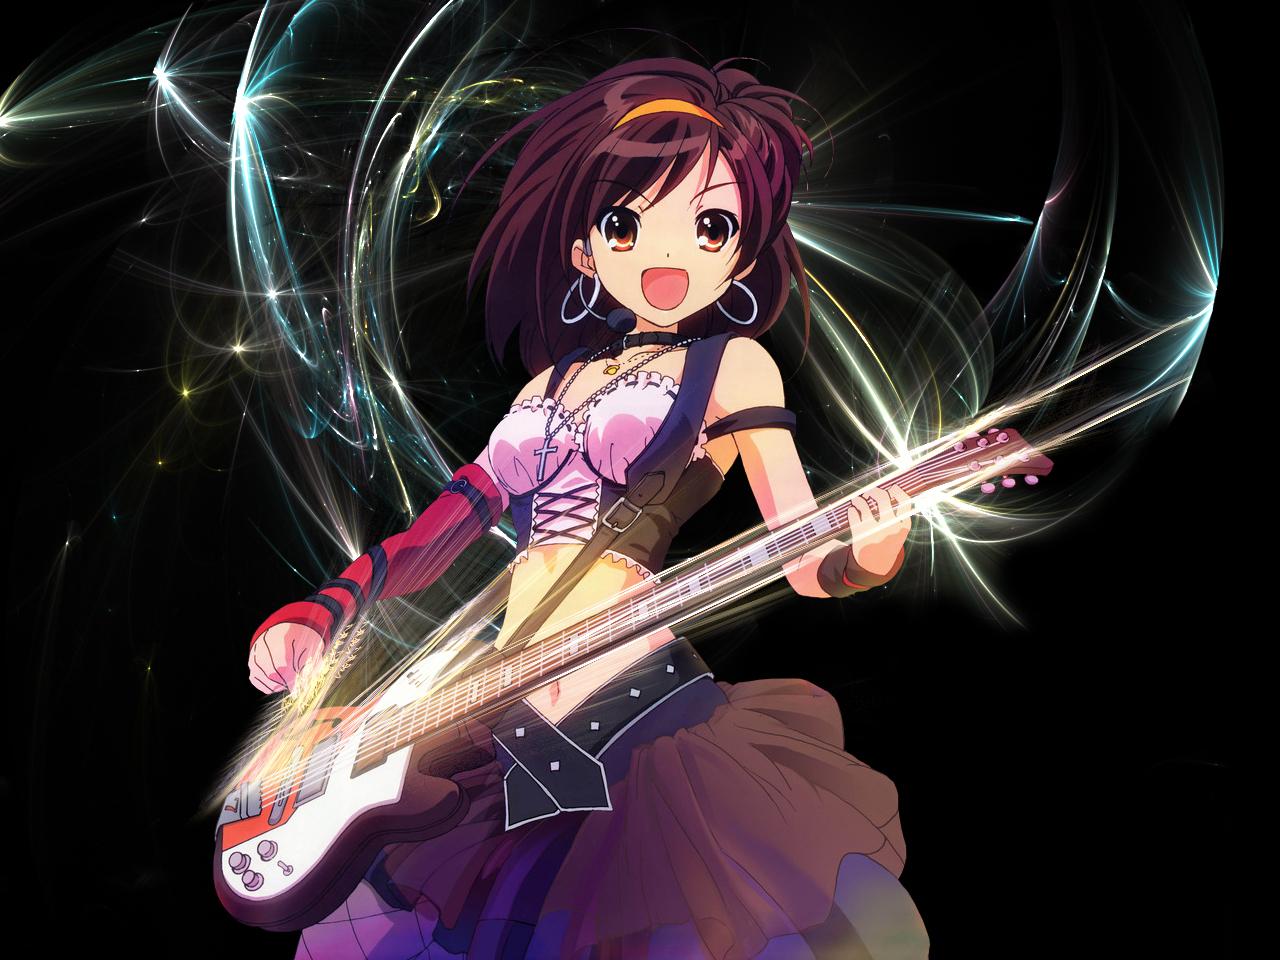 The Melancholy of Haruhi Suzumiya picture Haruhi-Guitar-the-melancholy-of-haruhi-suzumiya-3345788-1280-960